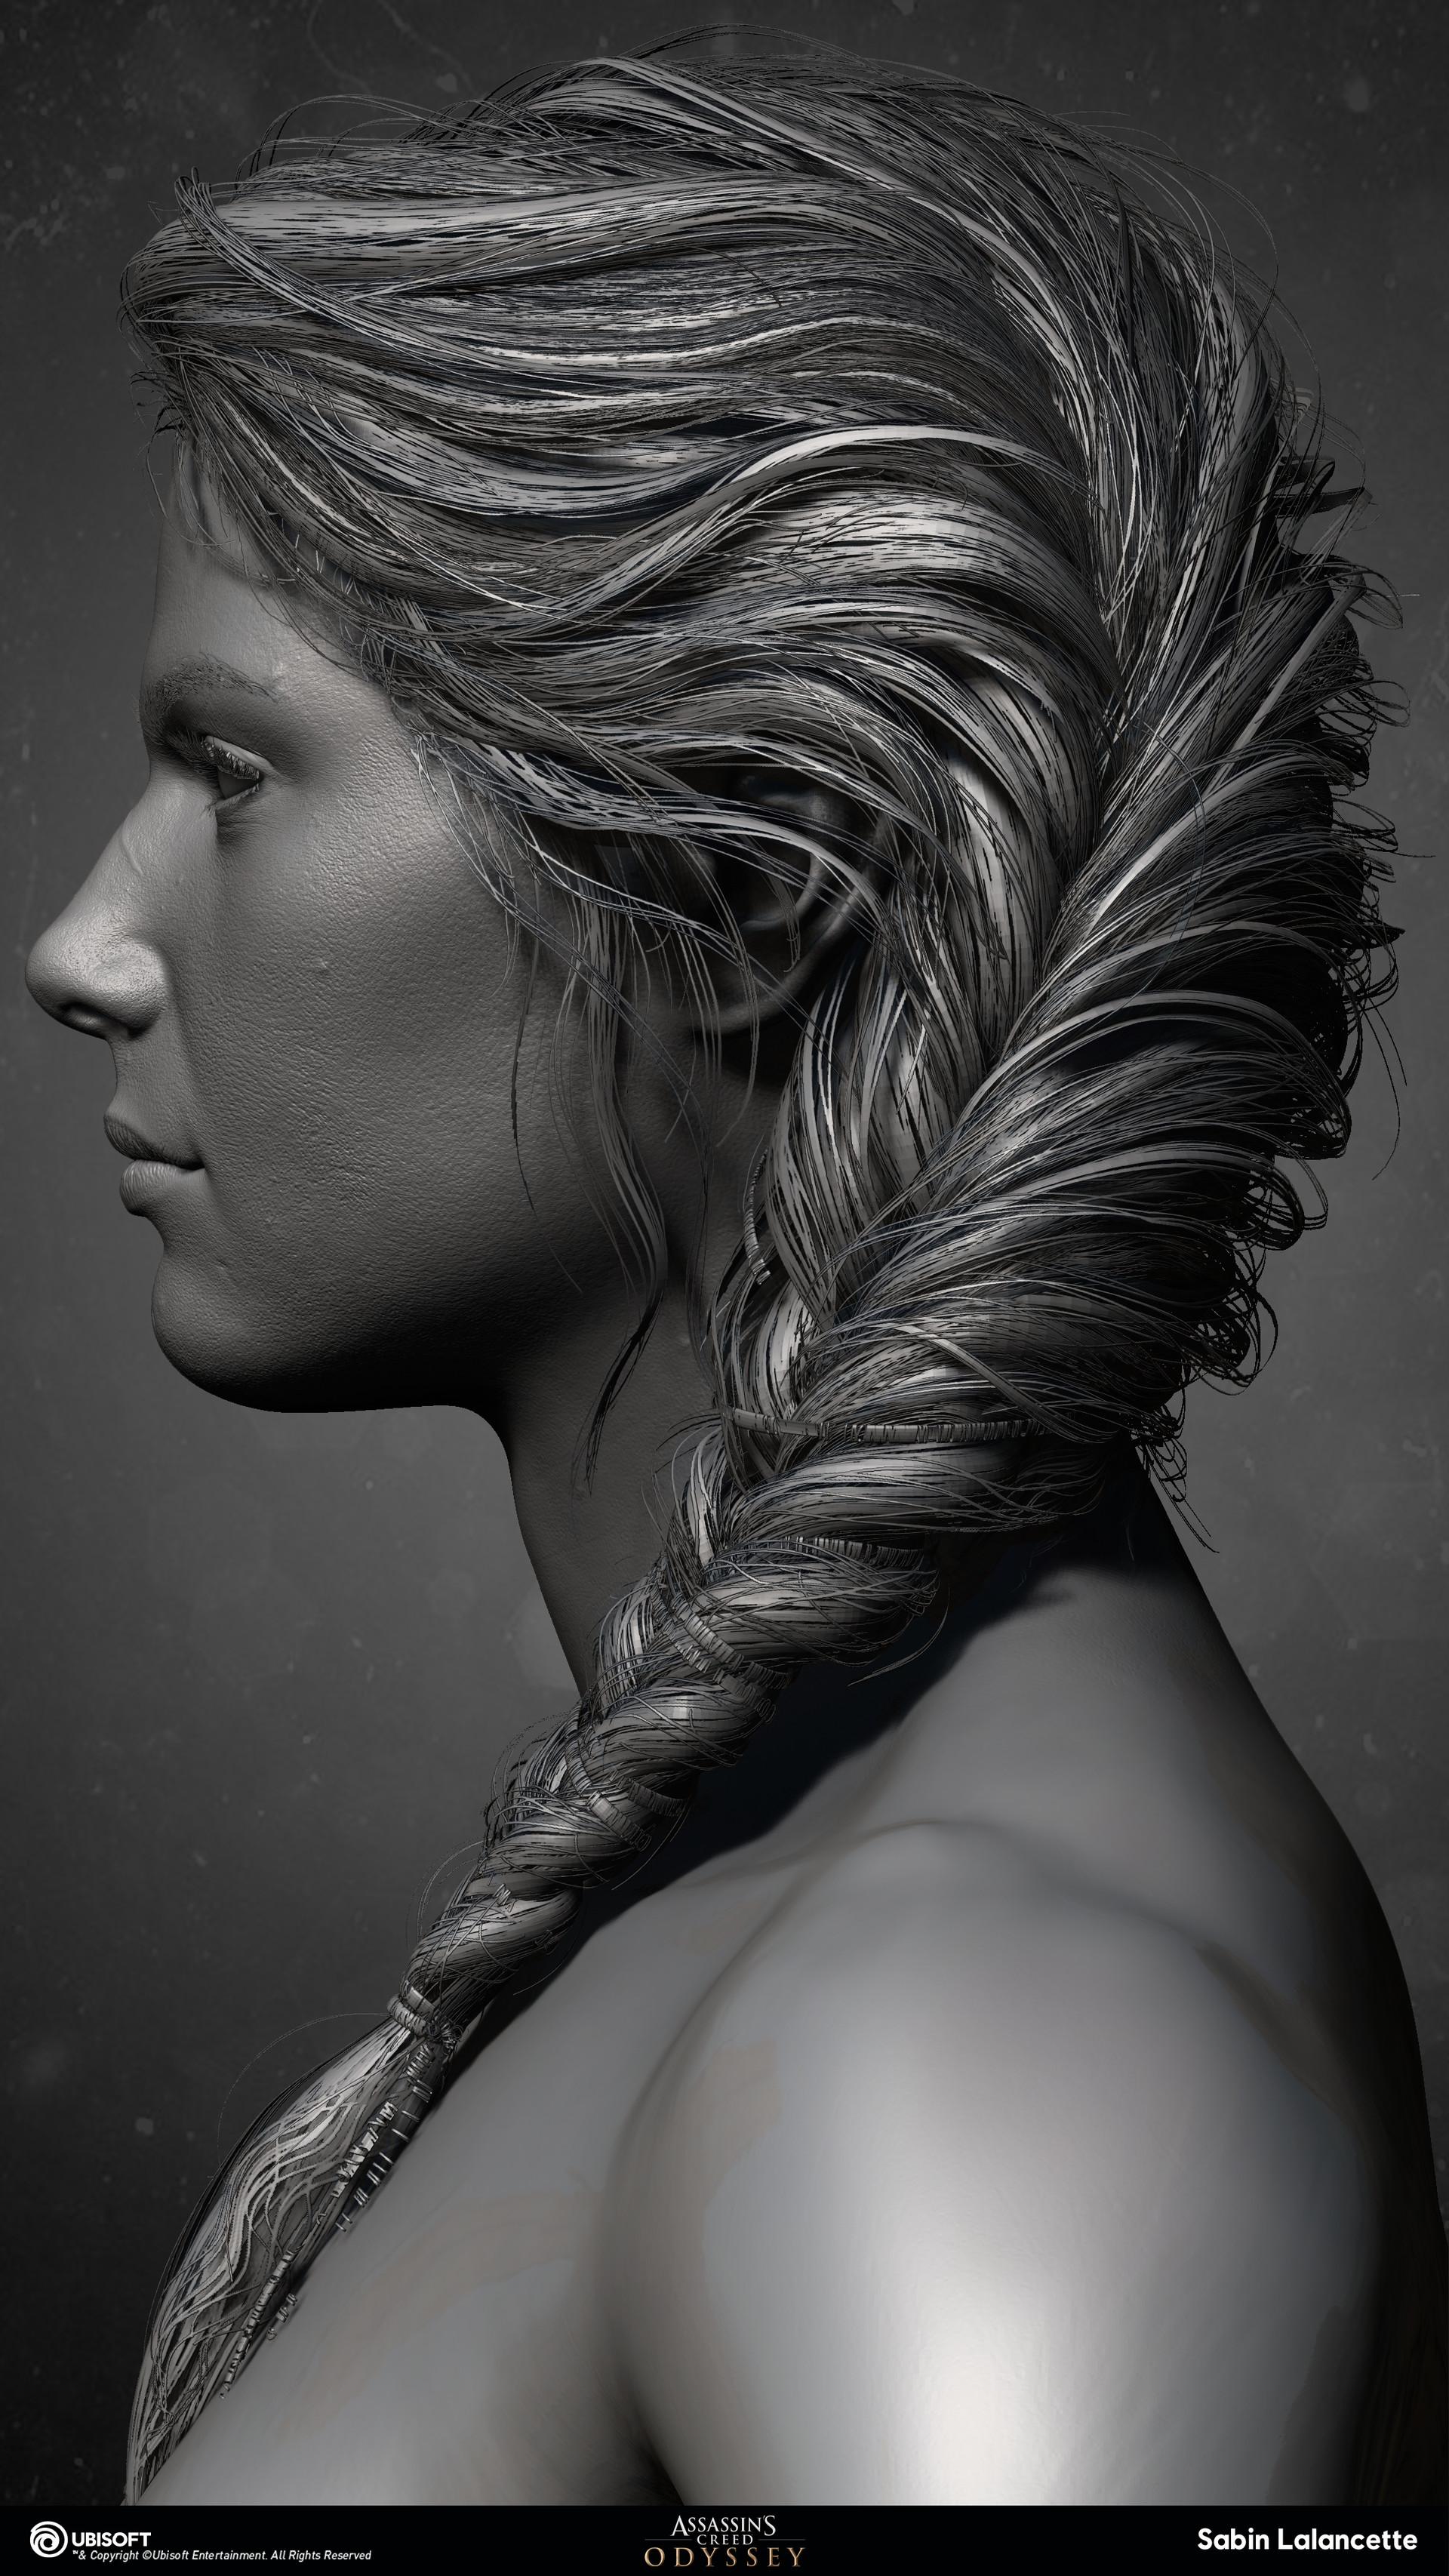 sabin-lalancette-artblast-fullsizezb-hex-portrait-neutral-left-kassandra-slalancette